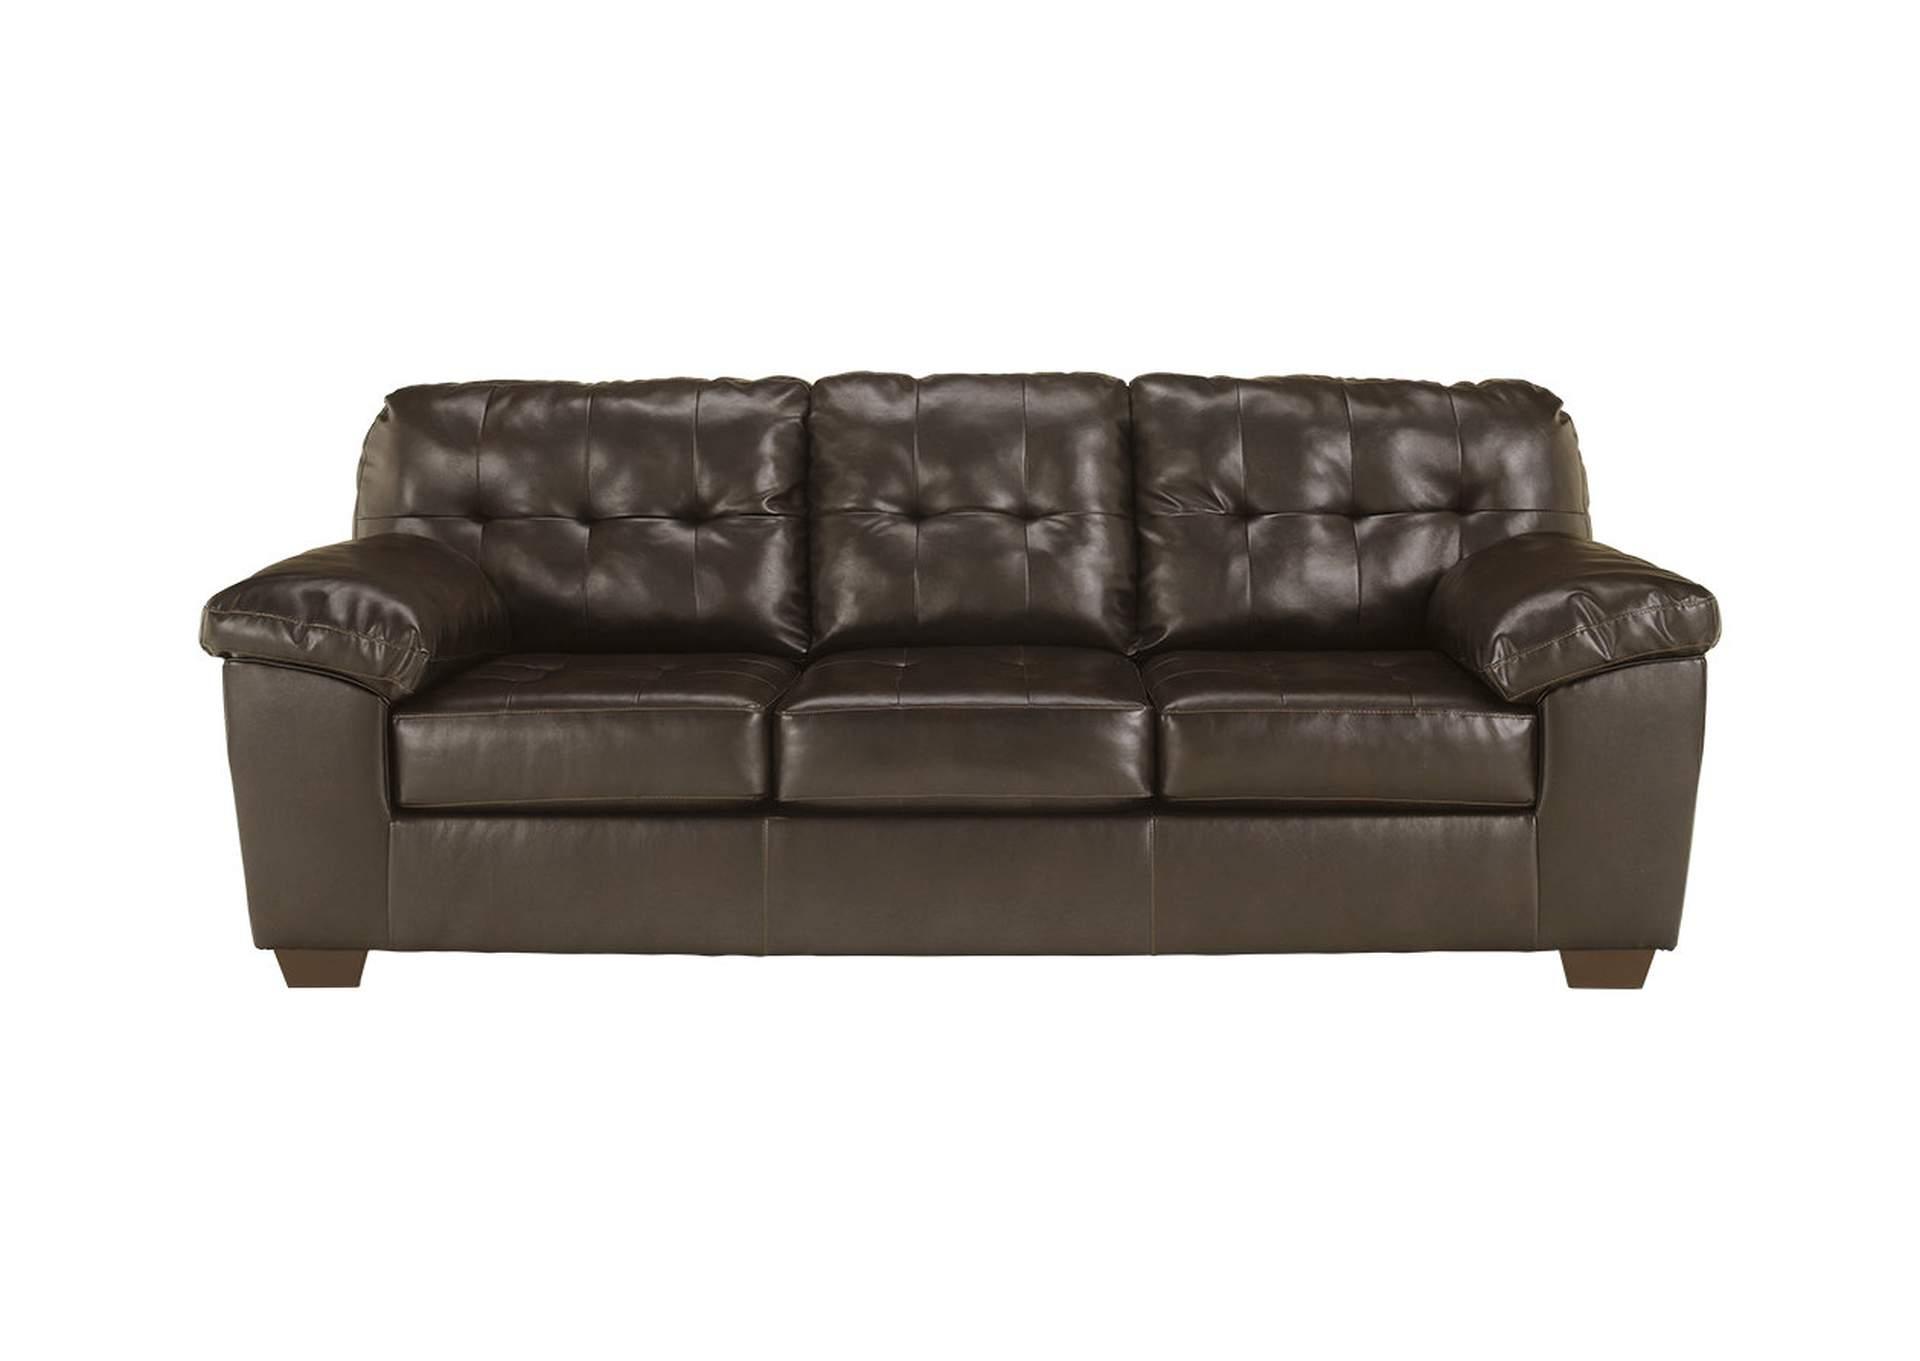 Alliston DuraBlend Queen Sleeper Sofa